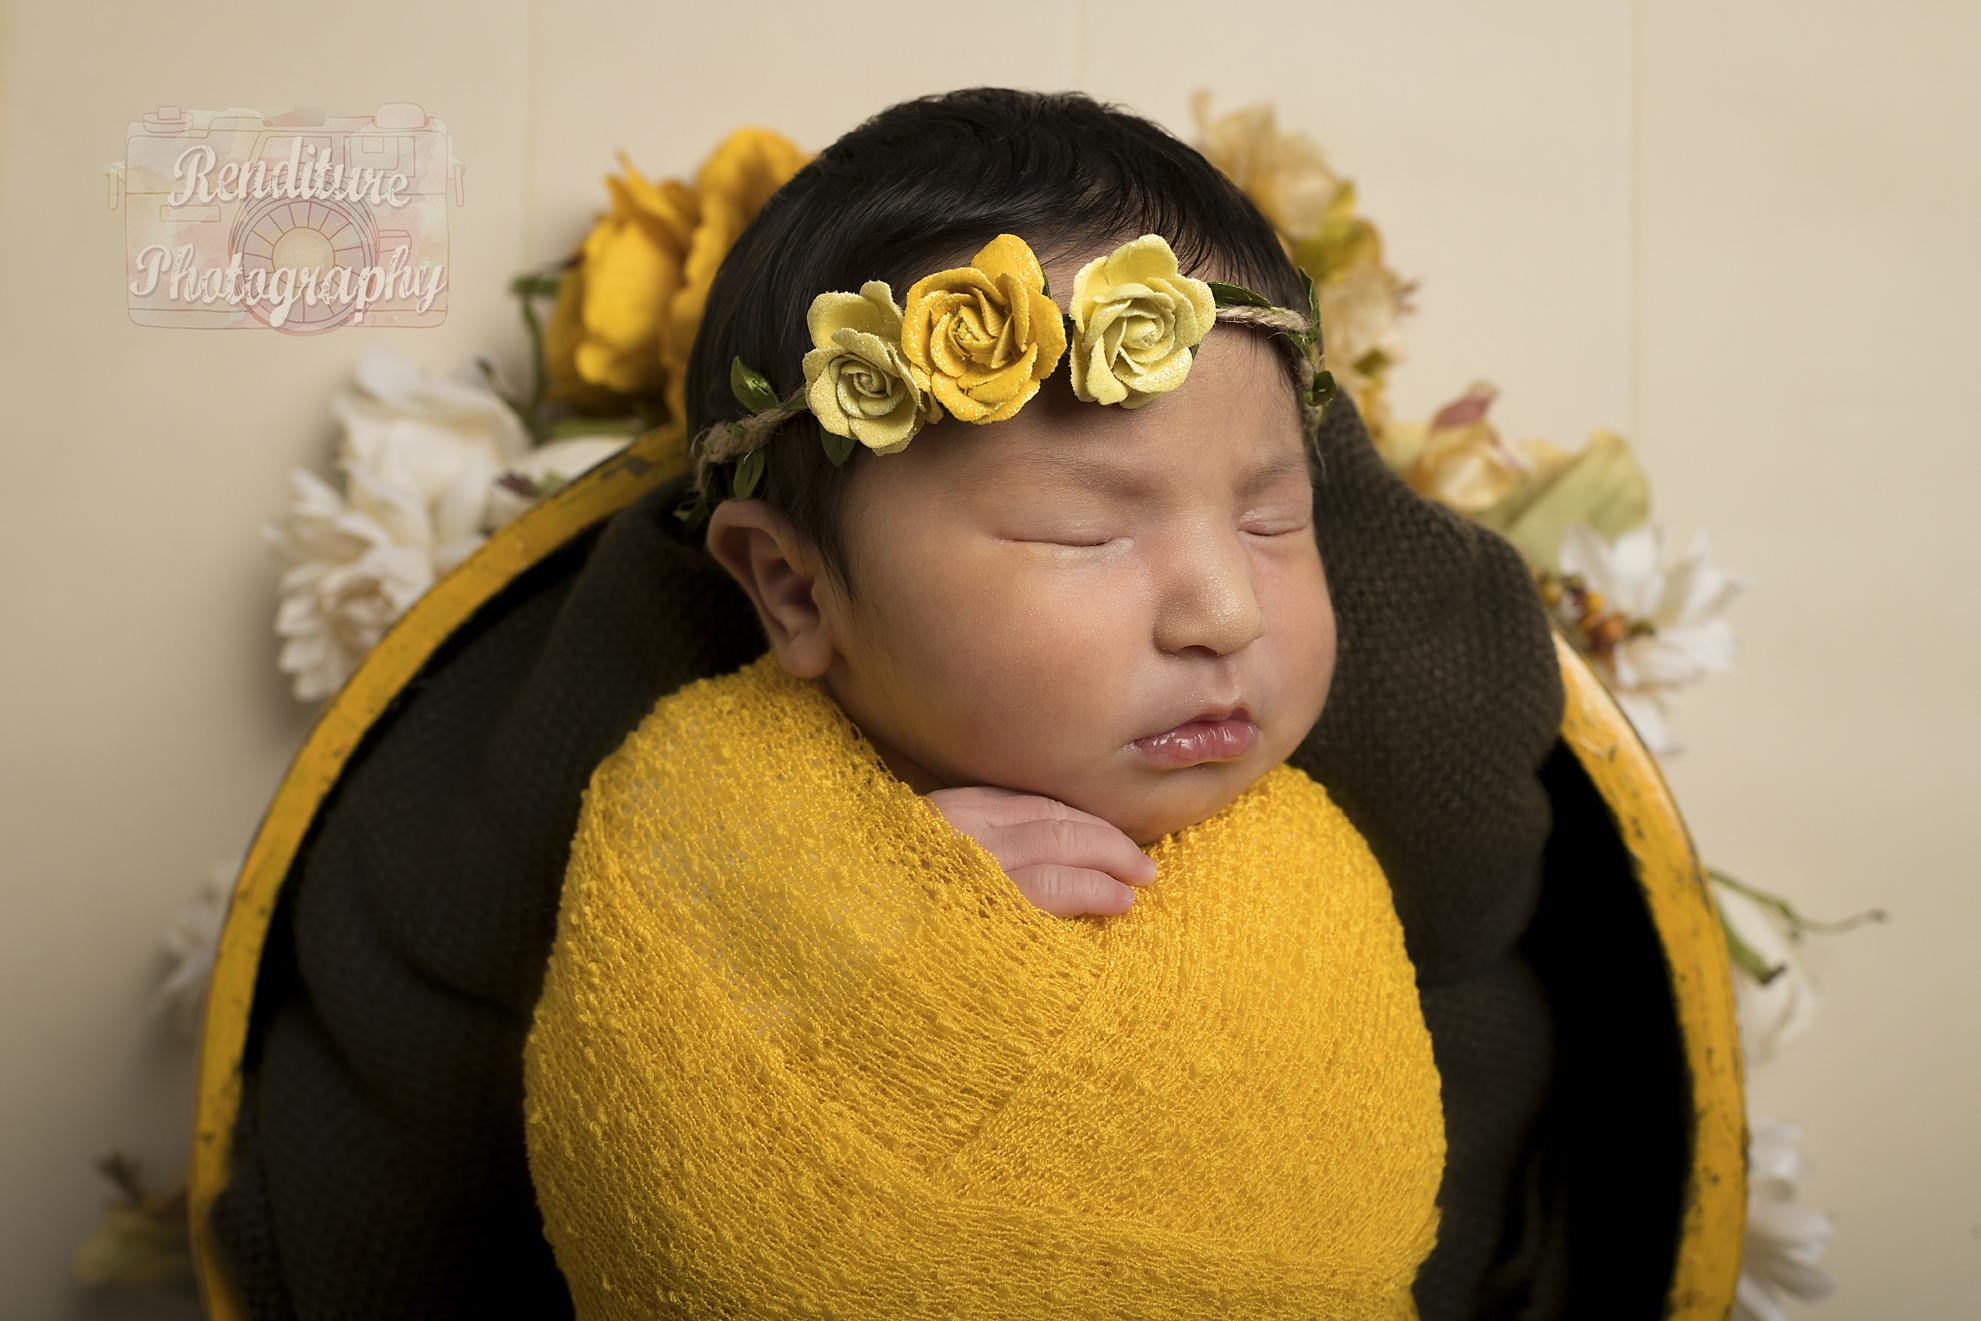 Saskatoon-Newborn-Family-Renditure-Photography-Photographer-Maternity-Pregnancy-Saskatchewan-Baby-614FBR.jpg